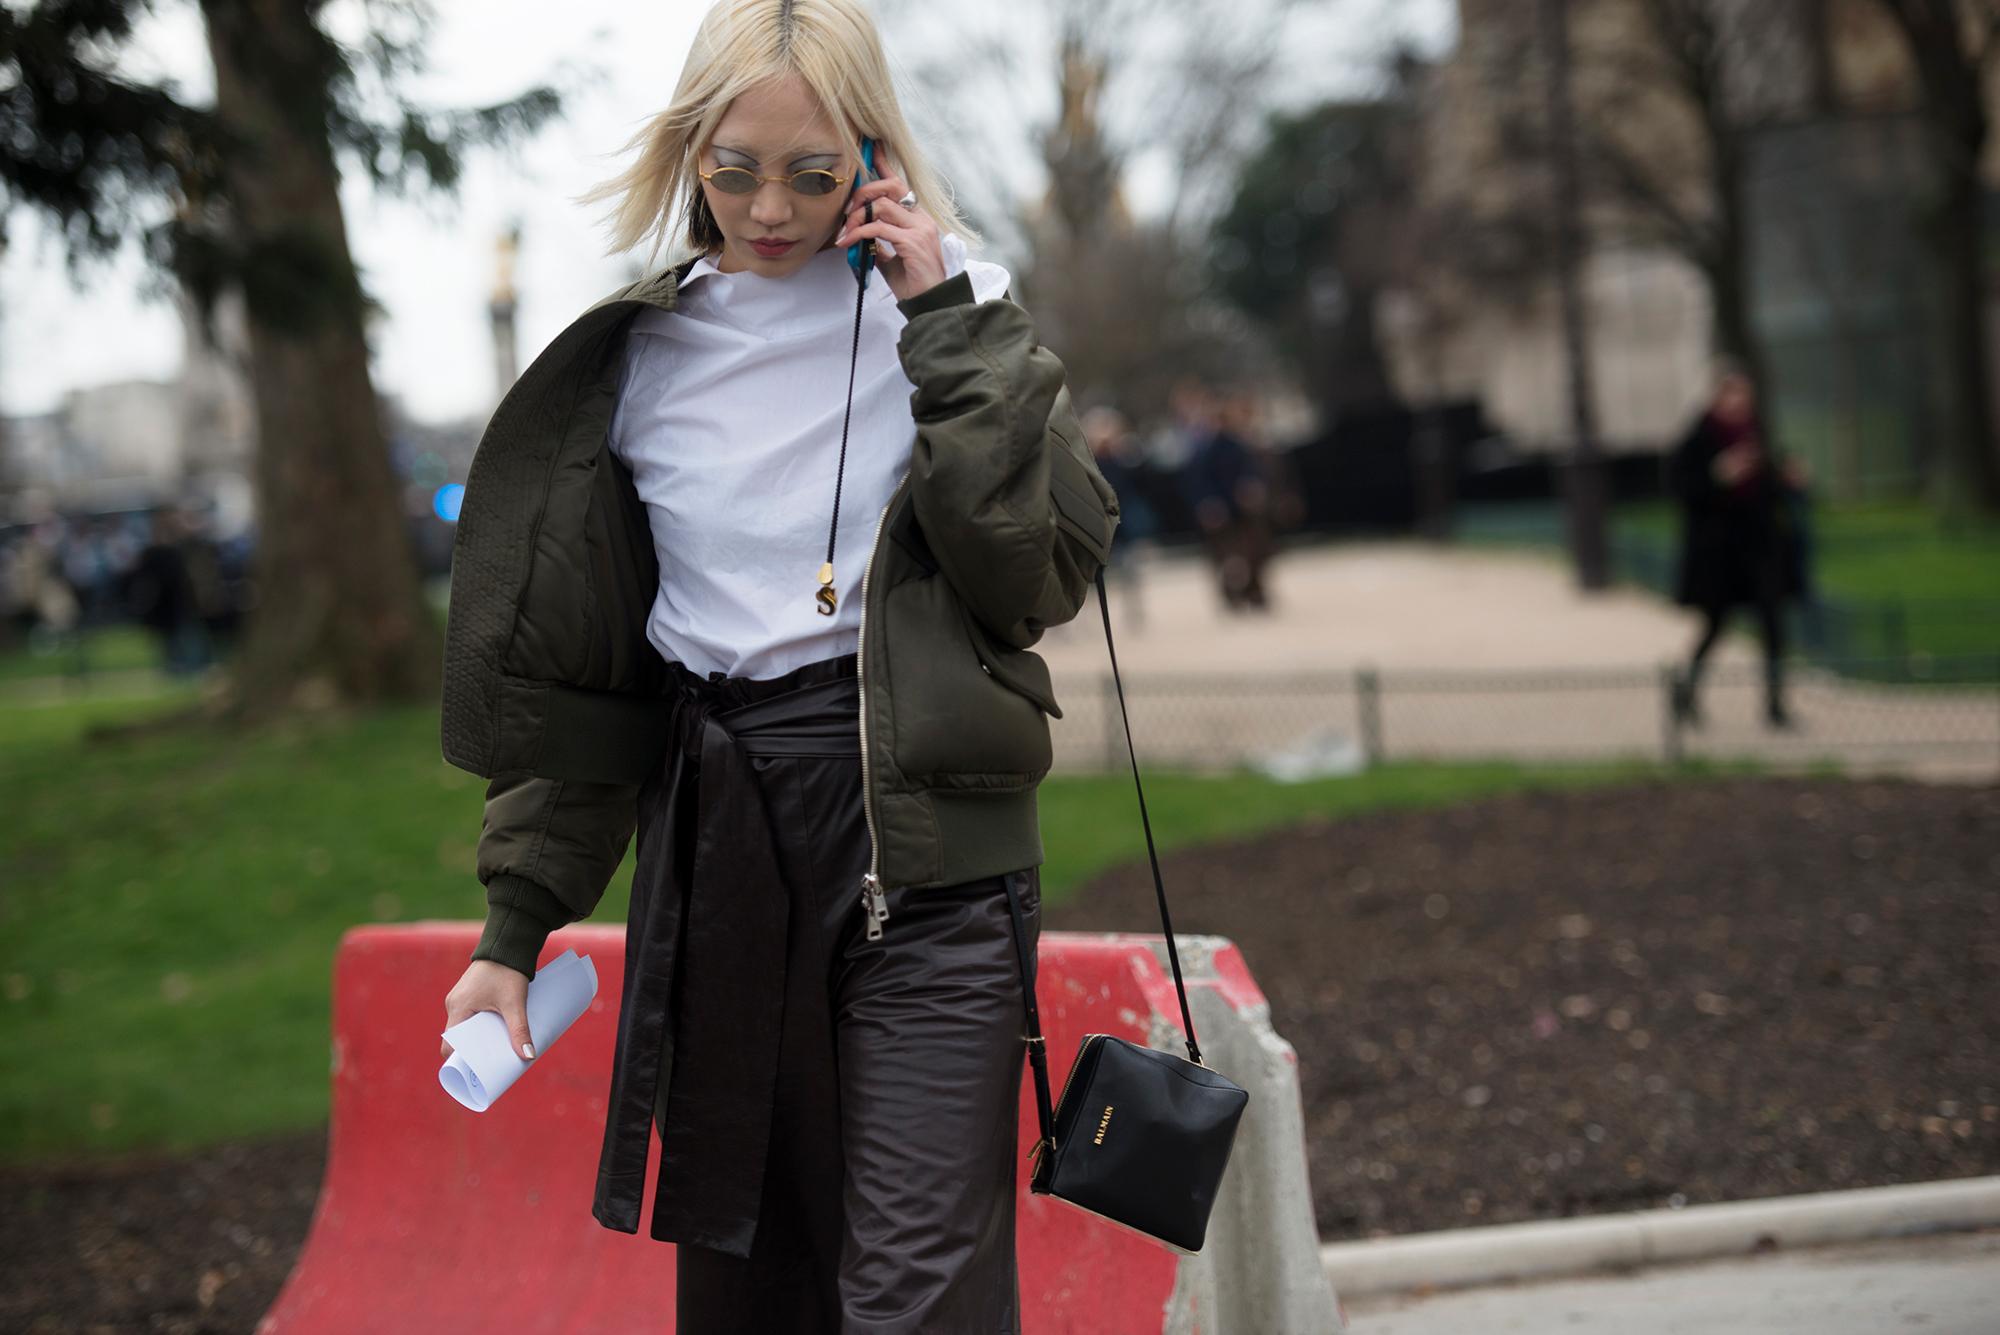 Streetsnaps Paris Fashion Week March 2017 Part 2 - 3747932